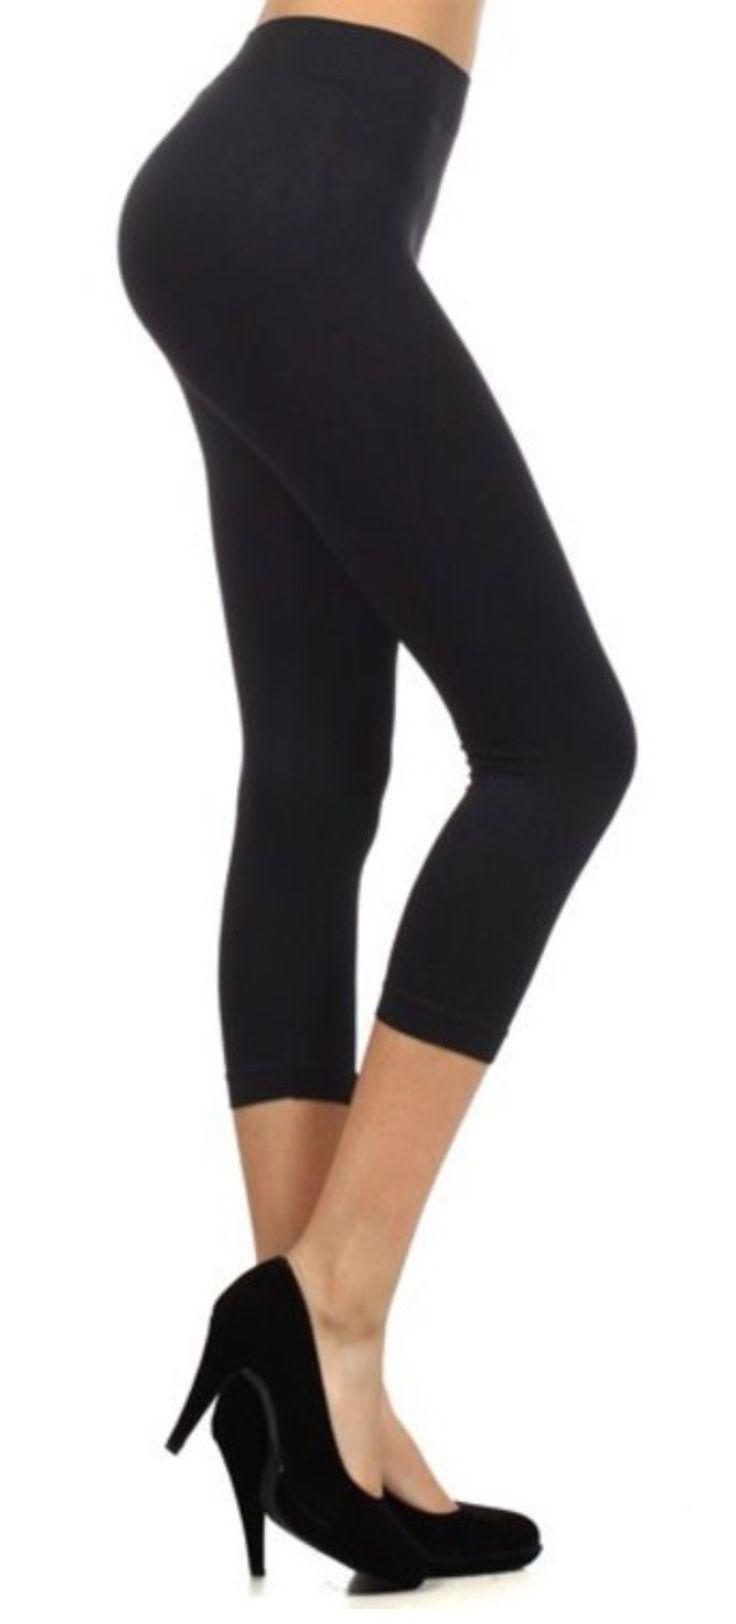 Ladies SOLID BLACK Leggings Capri and Full Length, OS/PLUS